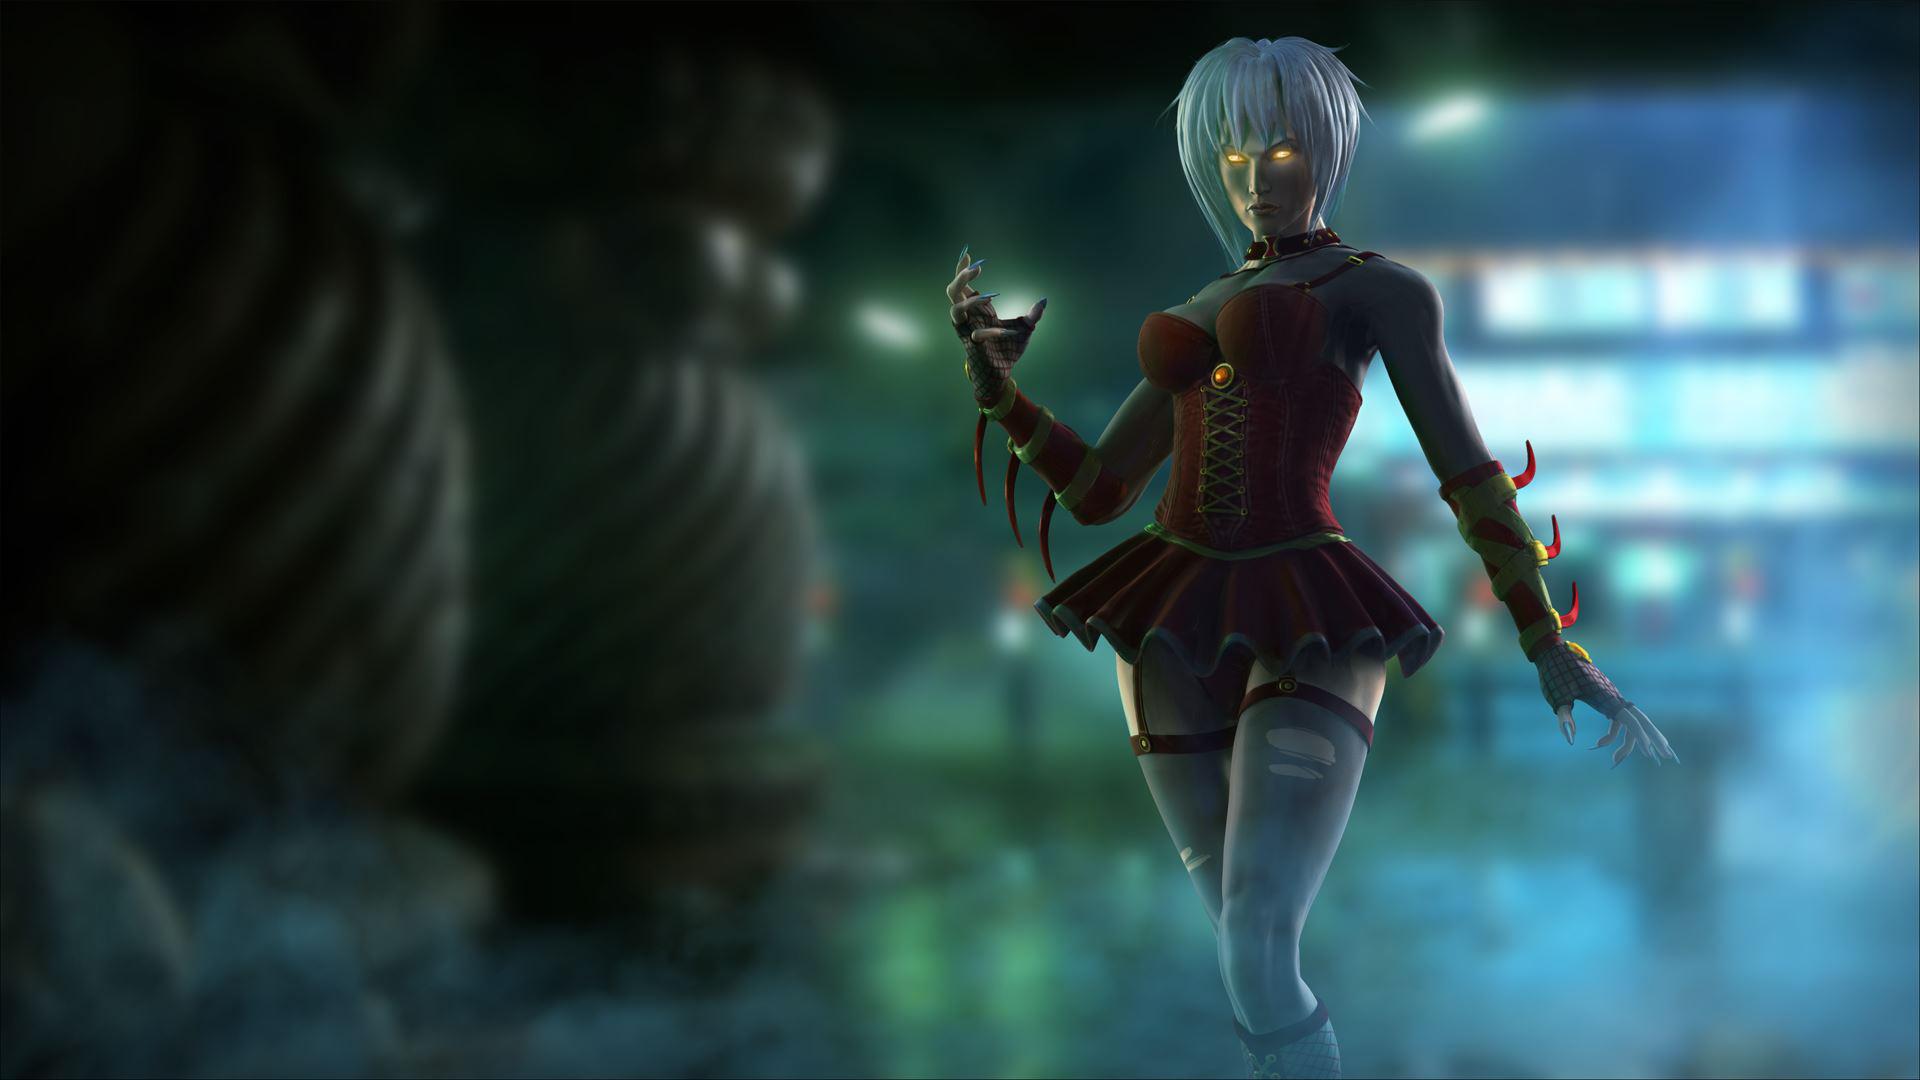 Sadira Killer Instinct by CheshireMalice on DeviantArt